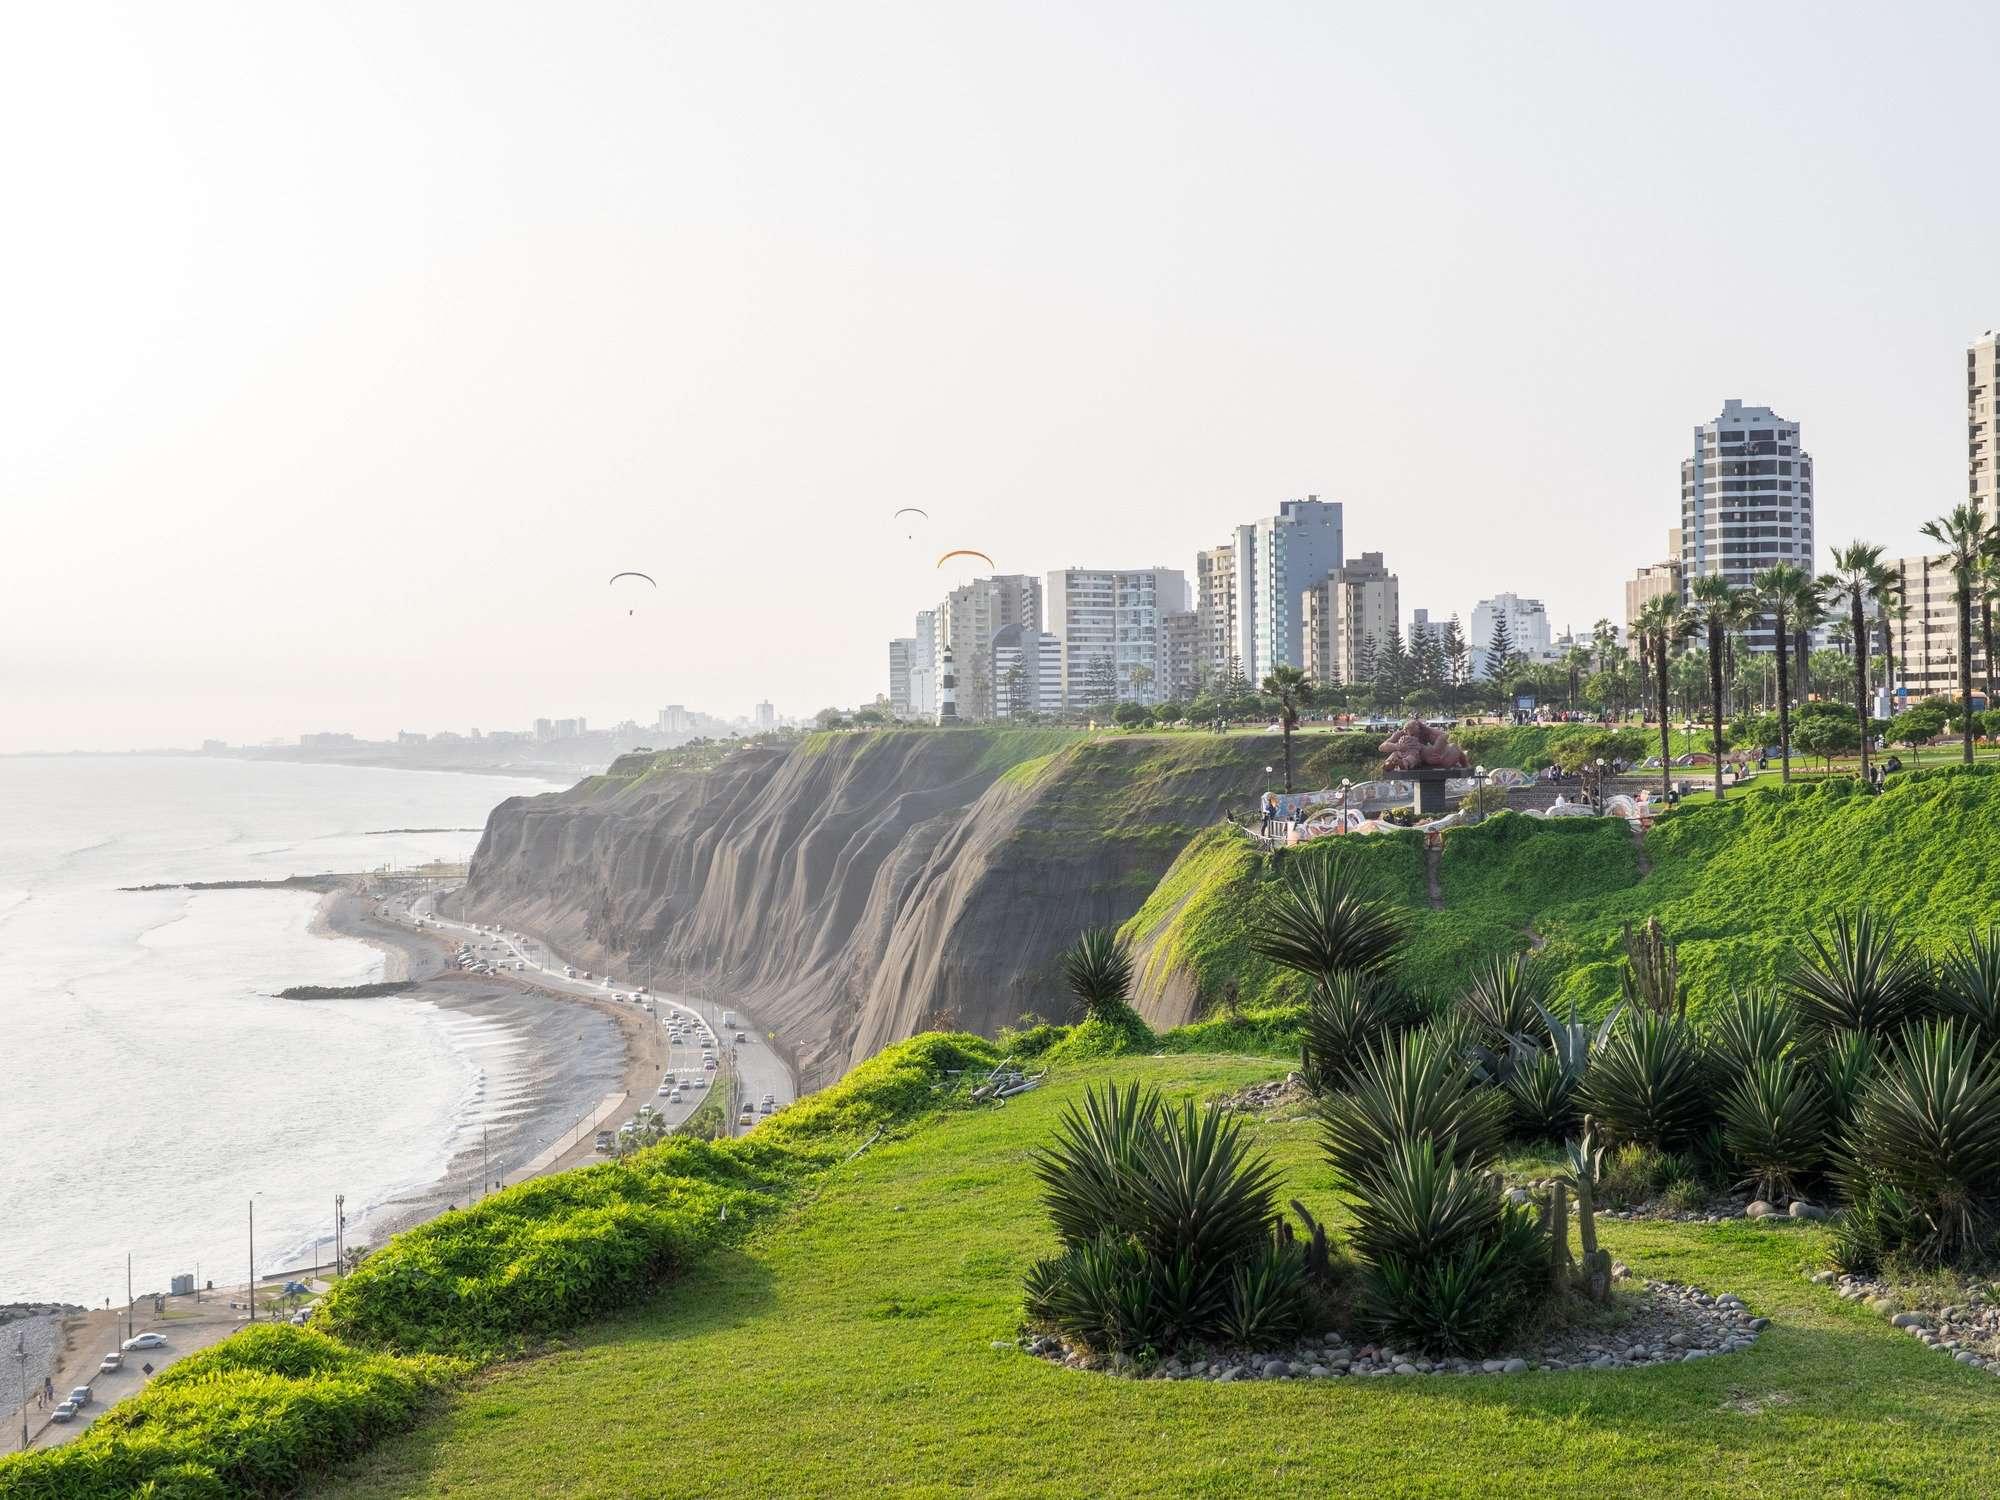 The Lima Coastline